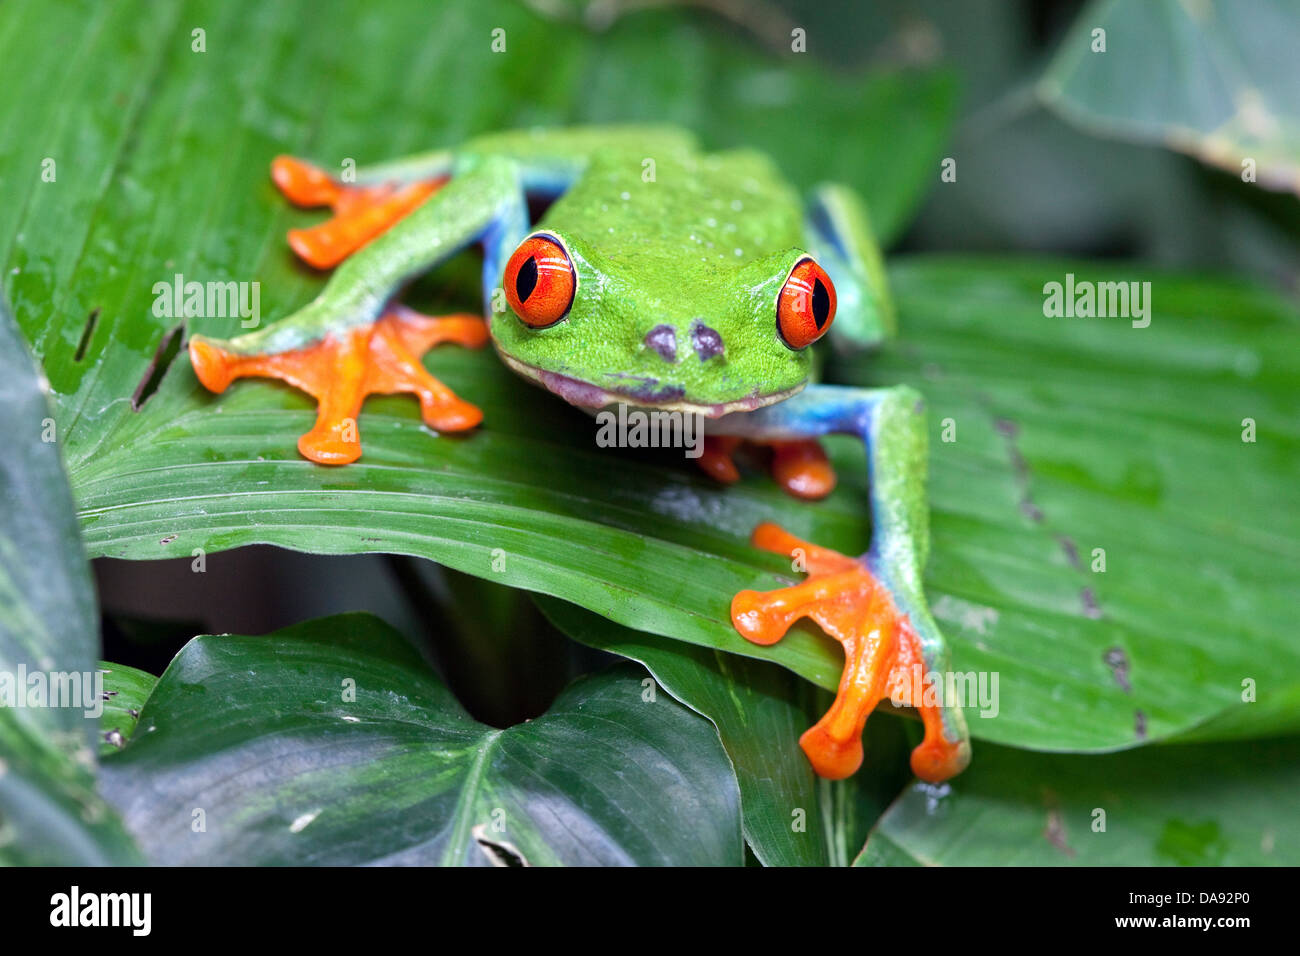 Red-eyed Tree Frog (Agalychnis callidryas), Costa Rica - Stock Image